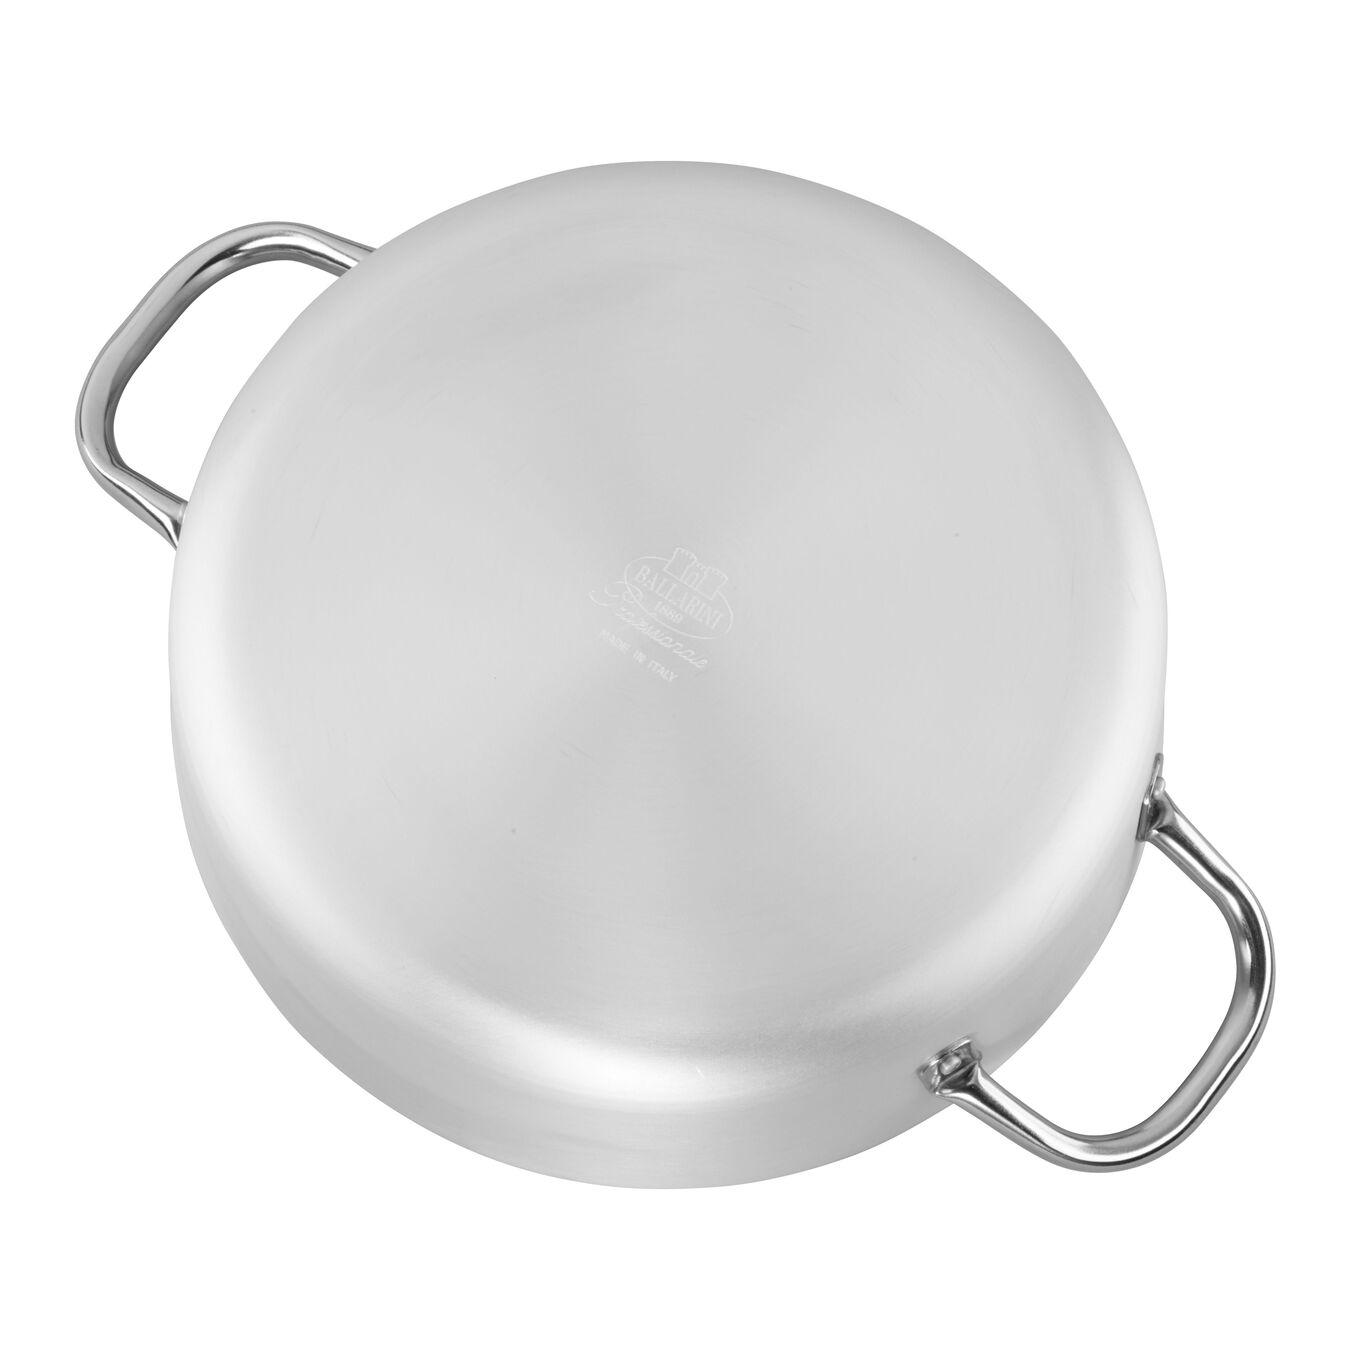 8.4-qt Aluminum Braiser,,large 3